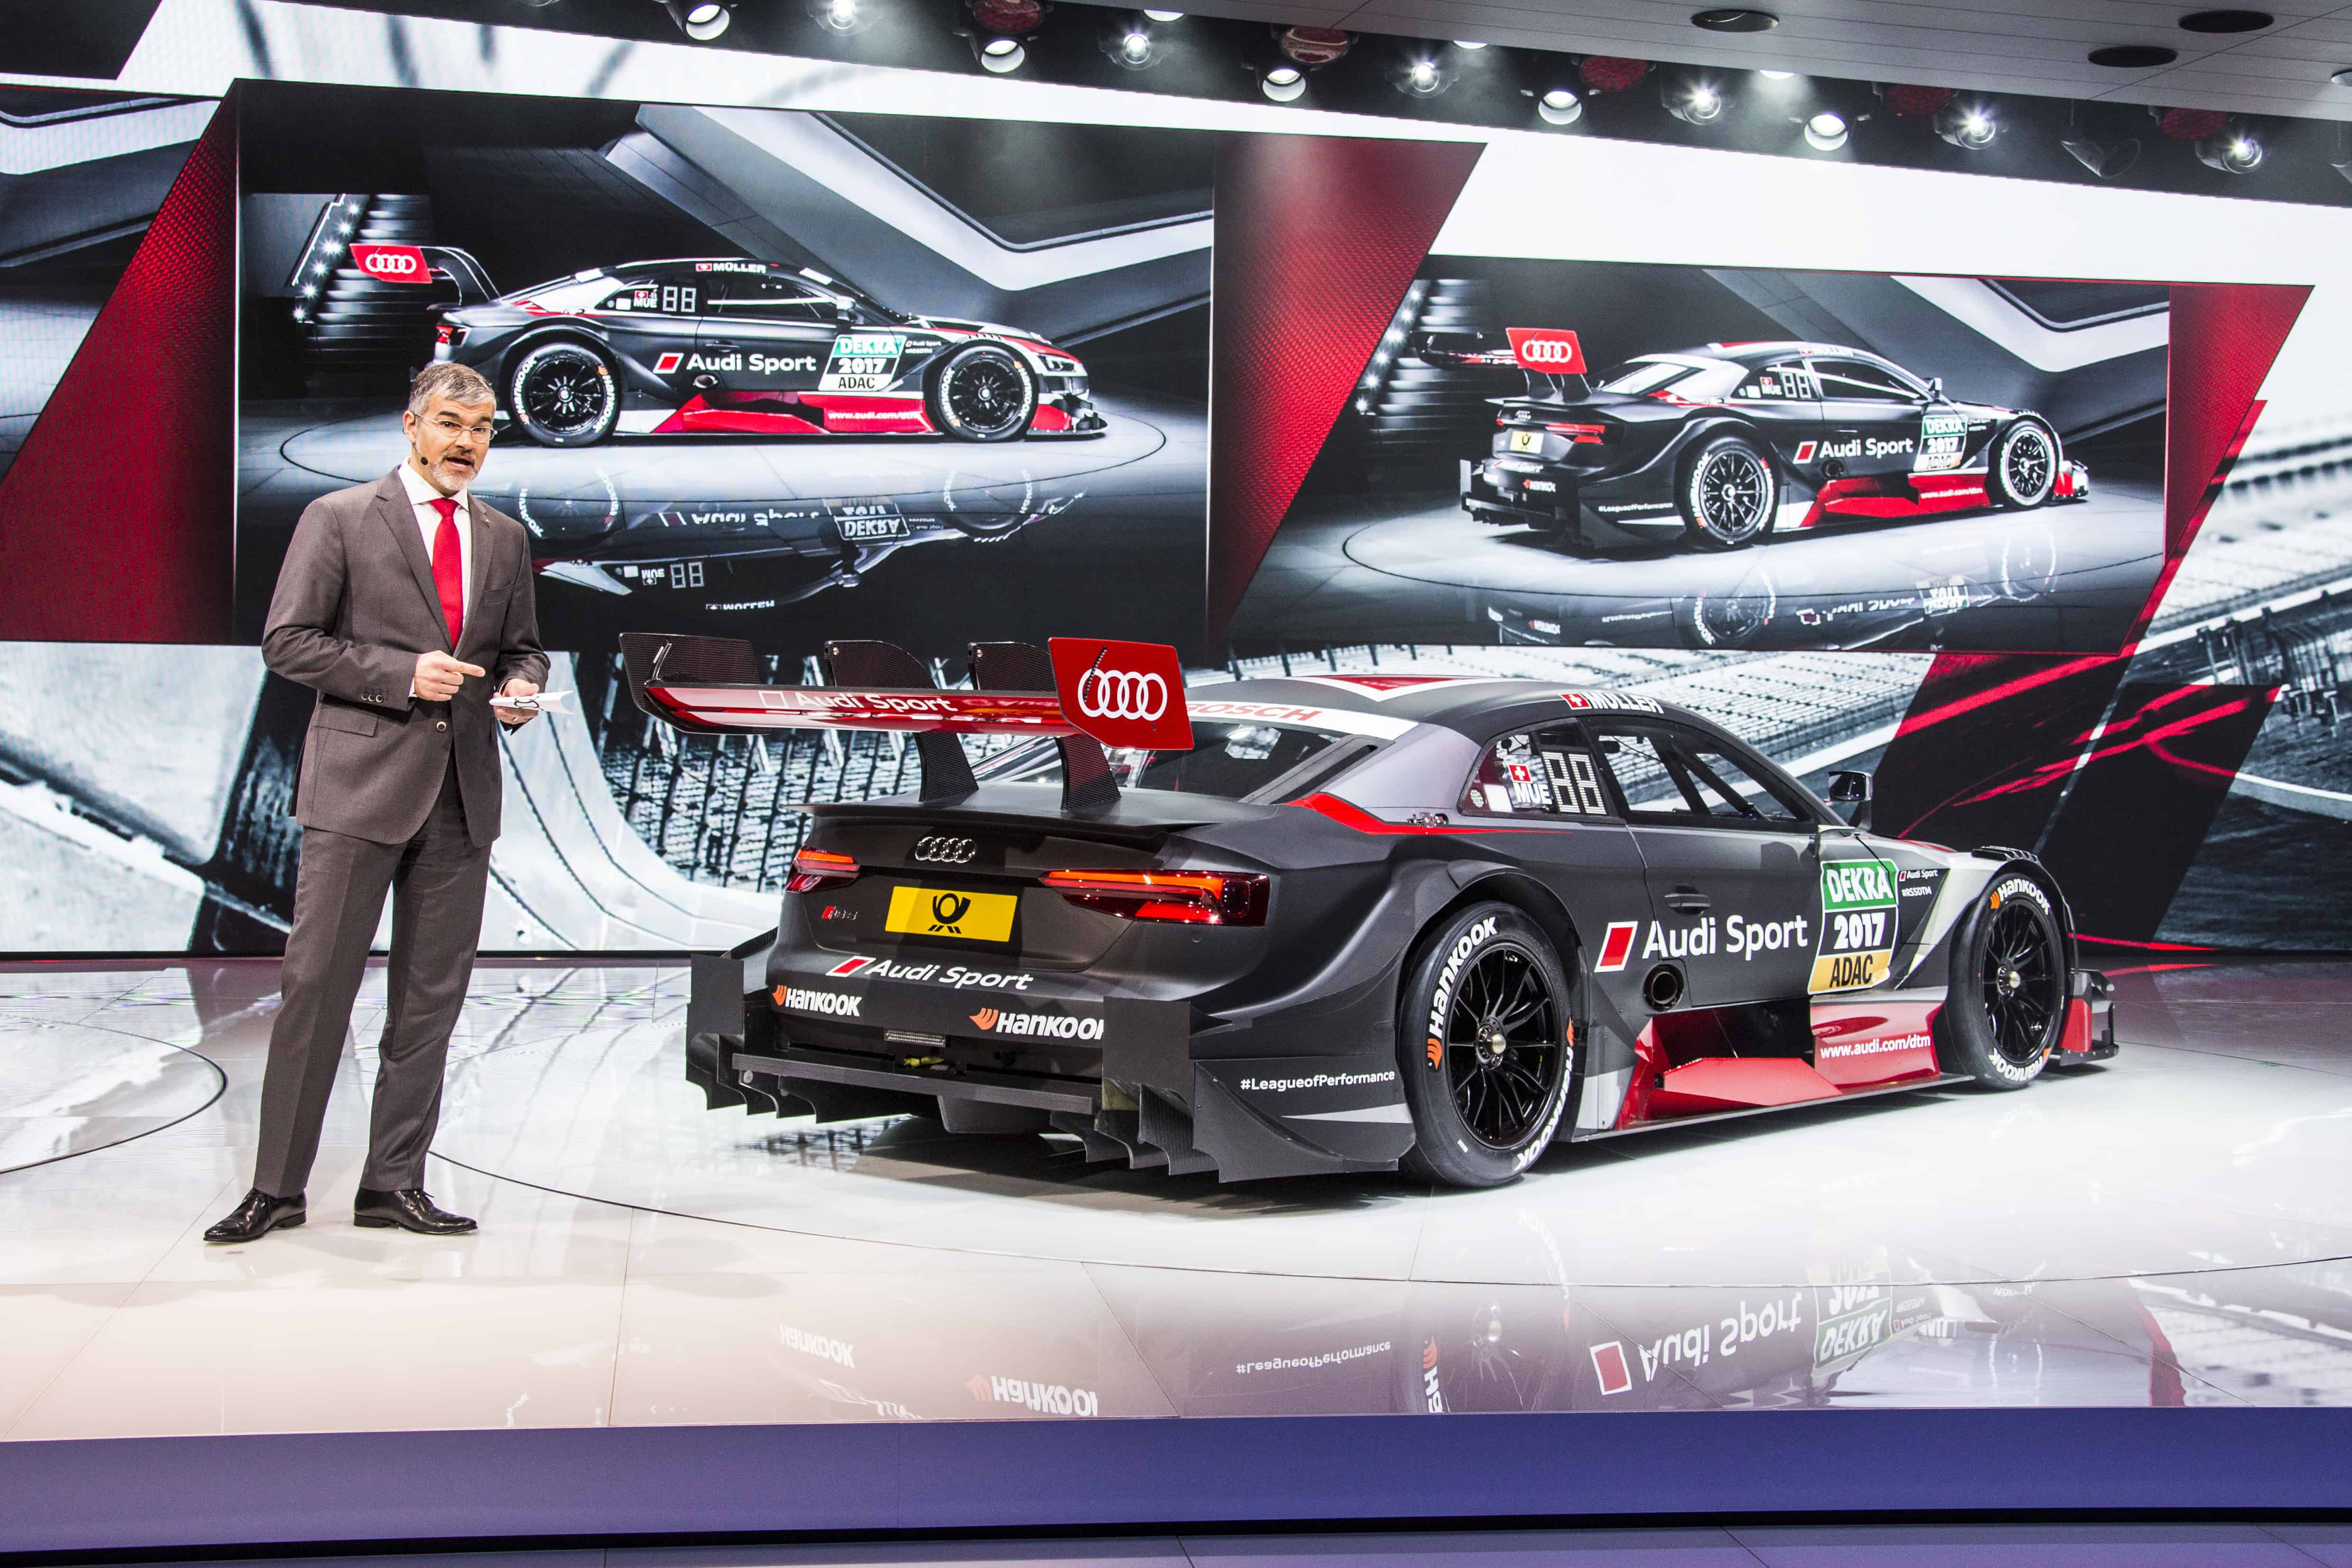 Audi RS5 DTM - Dieter Gass